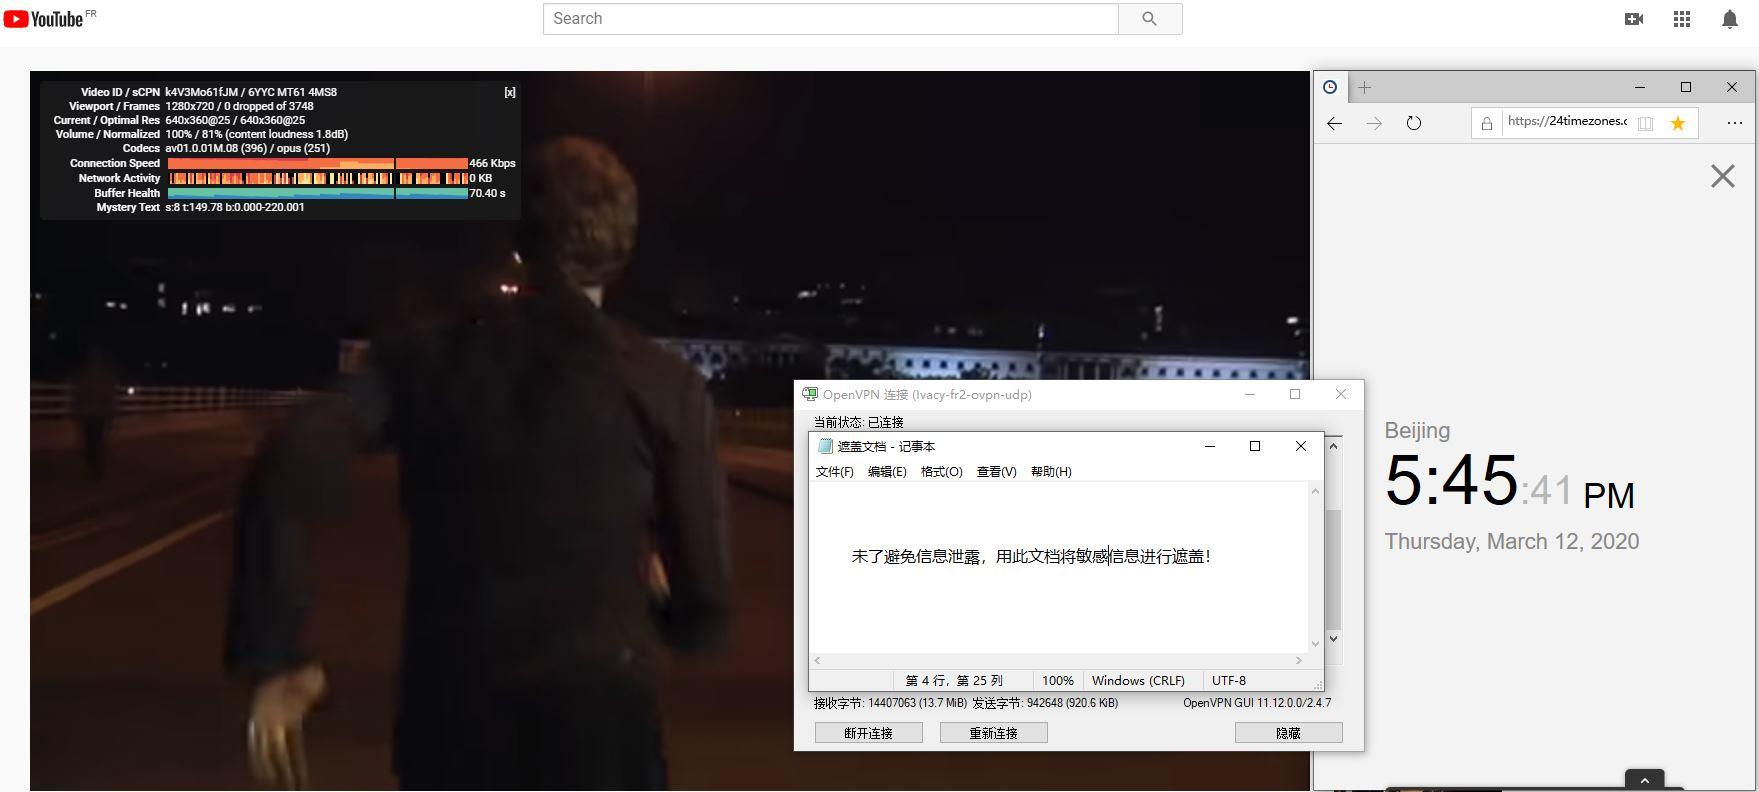 Windows10 IvacyVPN OpenVPN FR-2 中国VPN翻墙 科学上网 Youtube测速 - 20200312